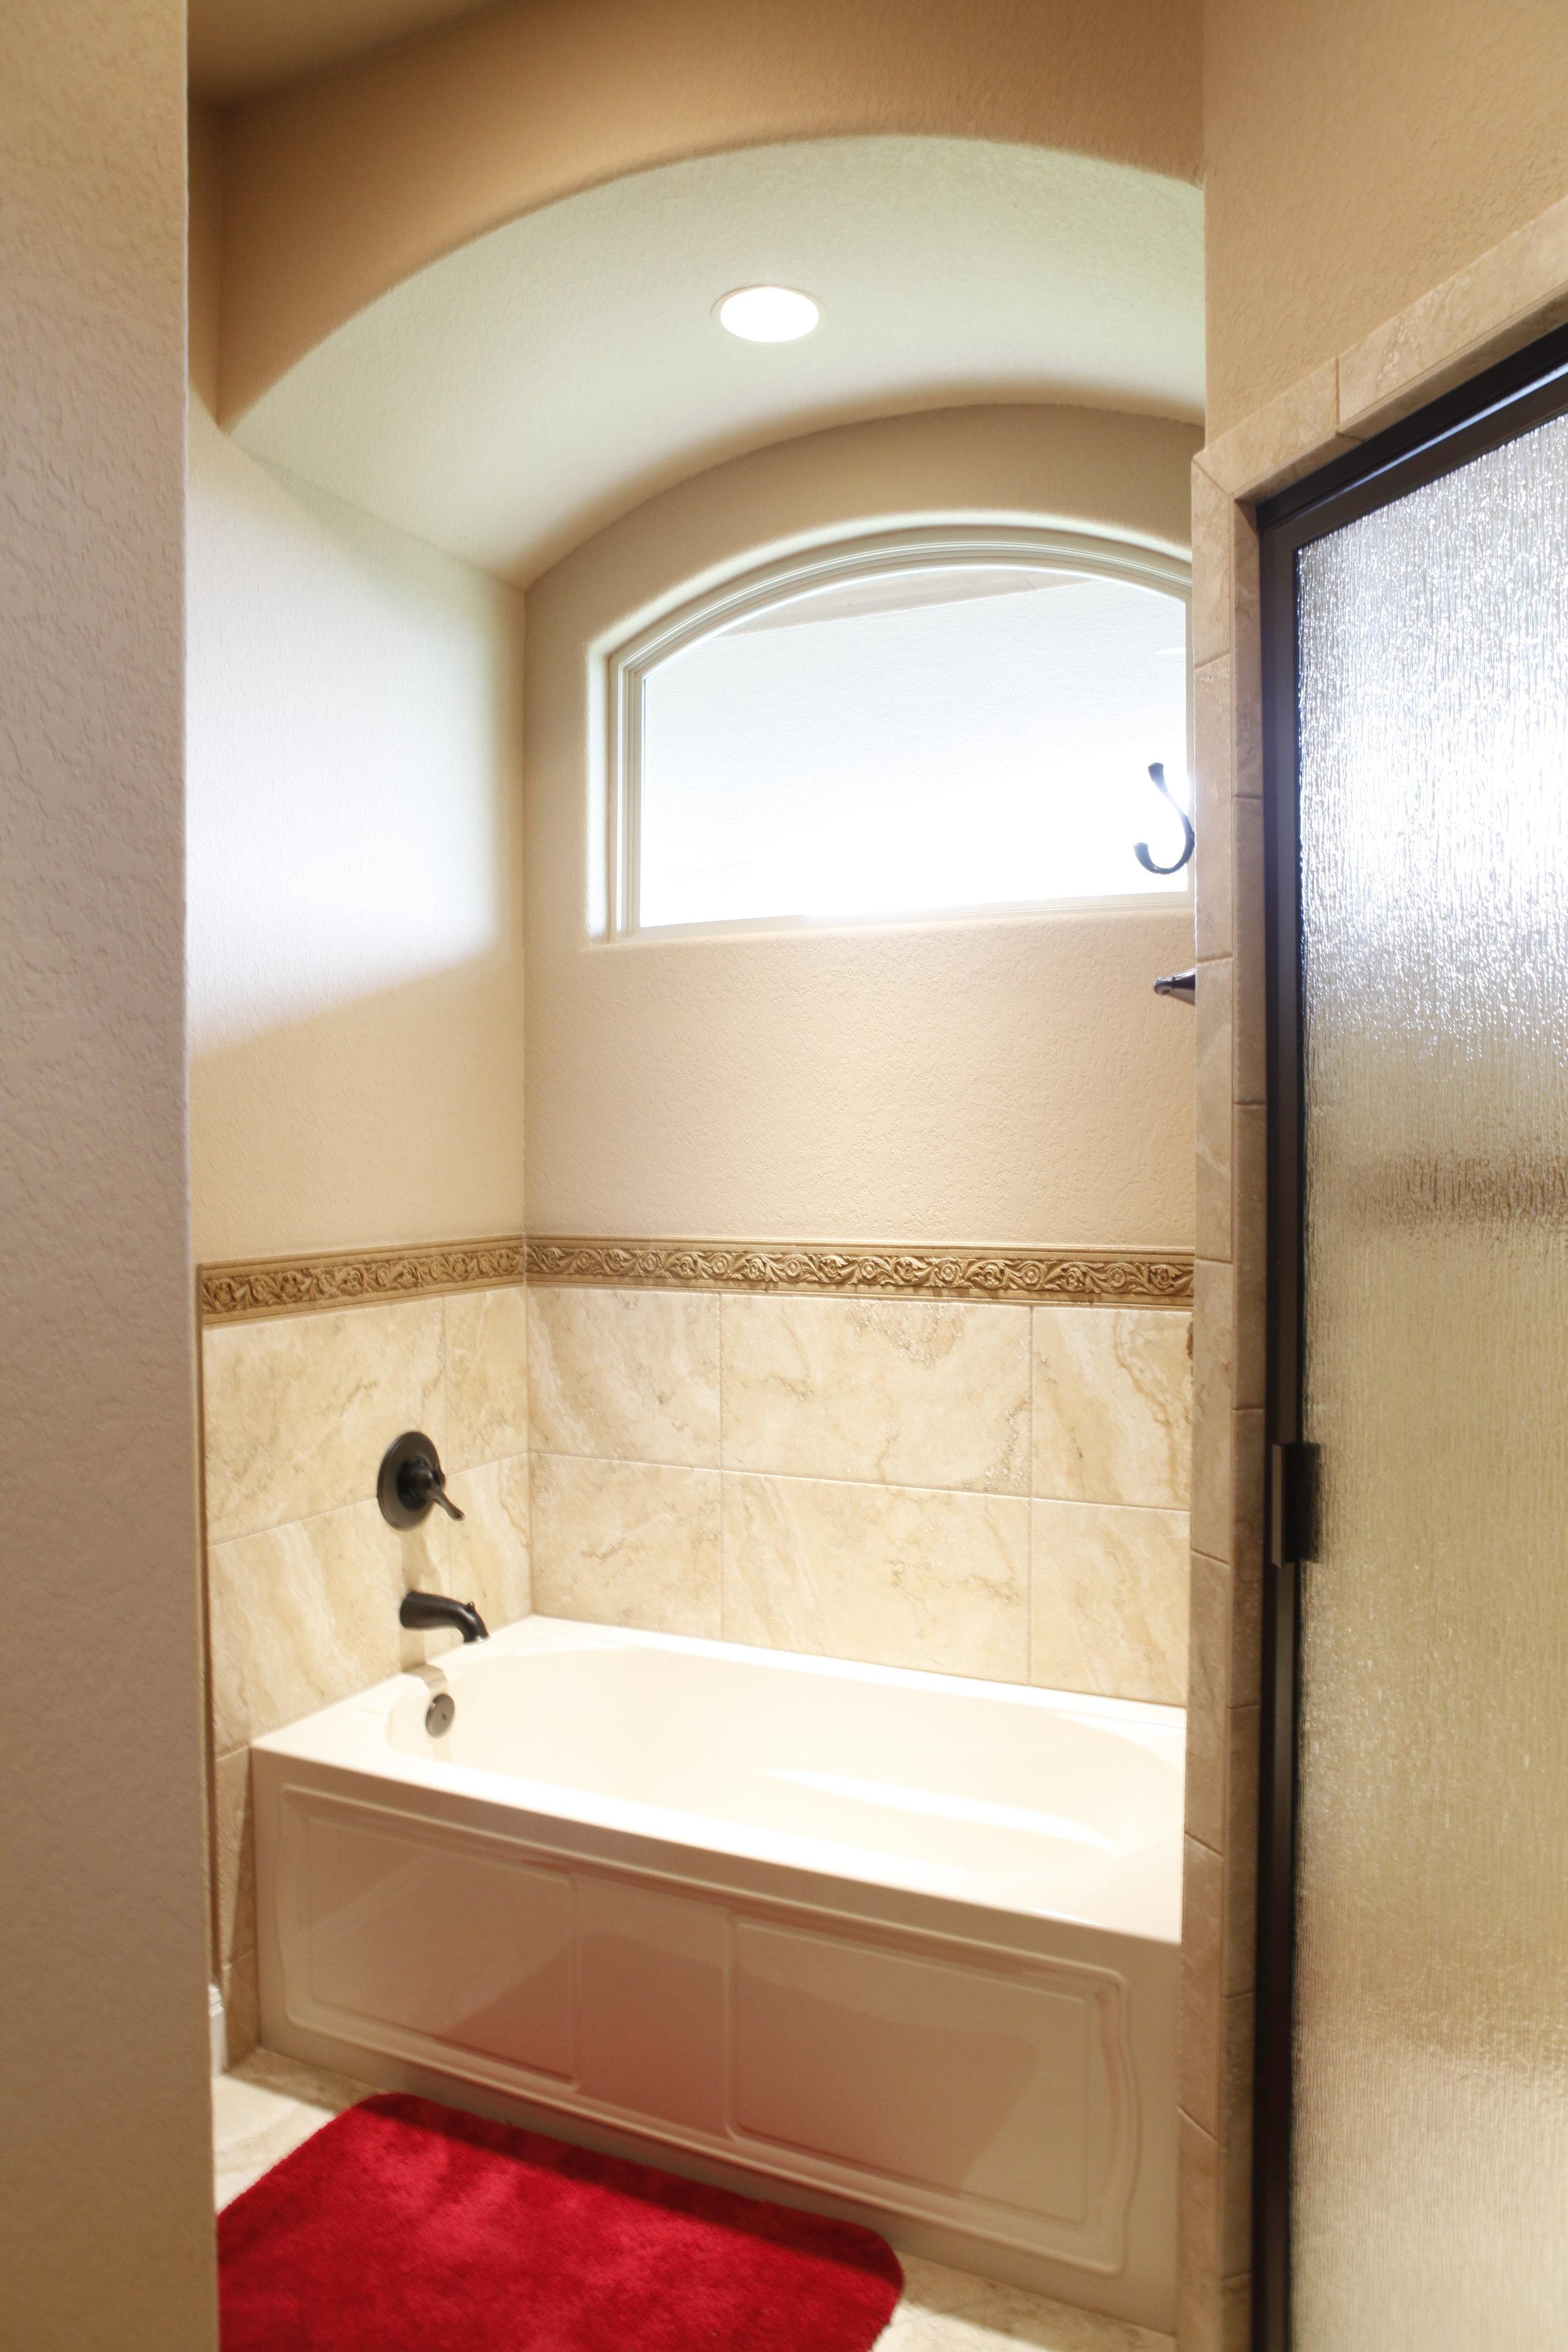 30-bath 4 - shower.JPG